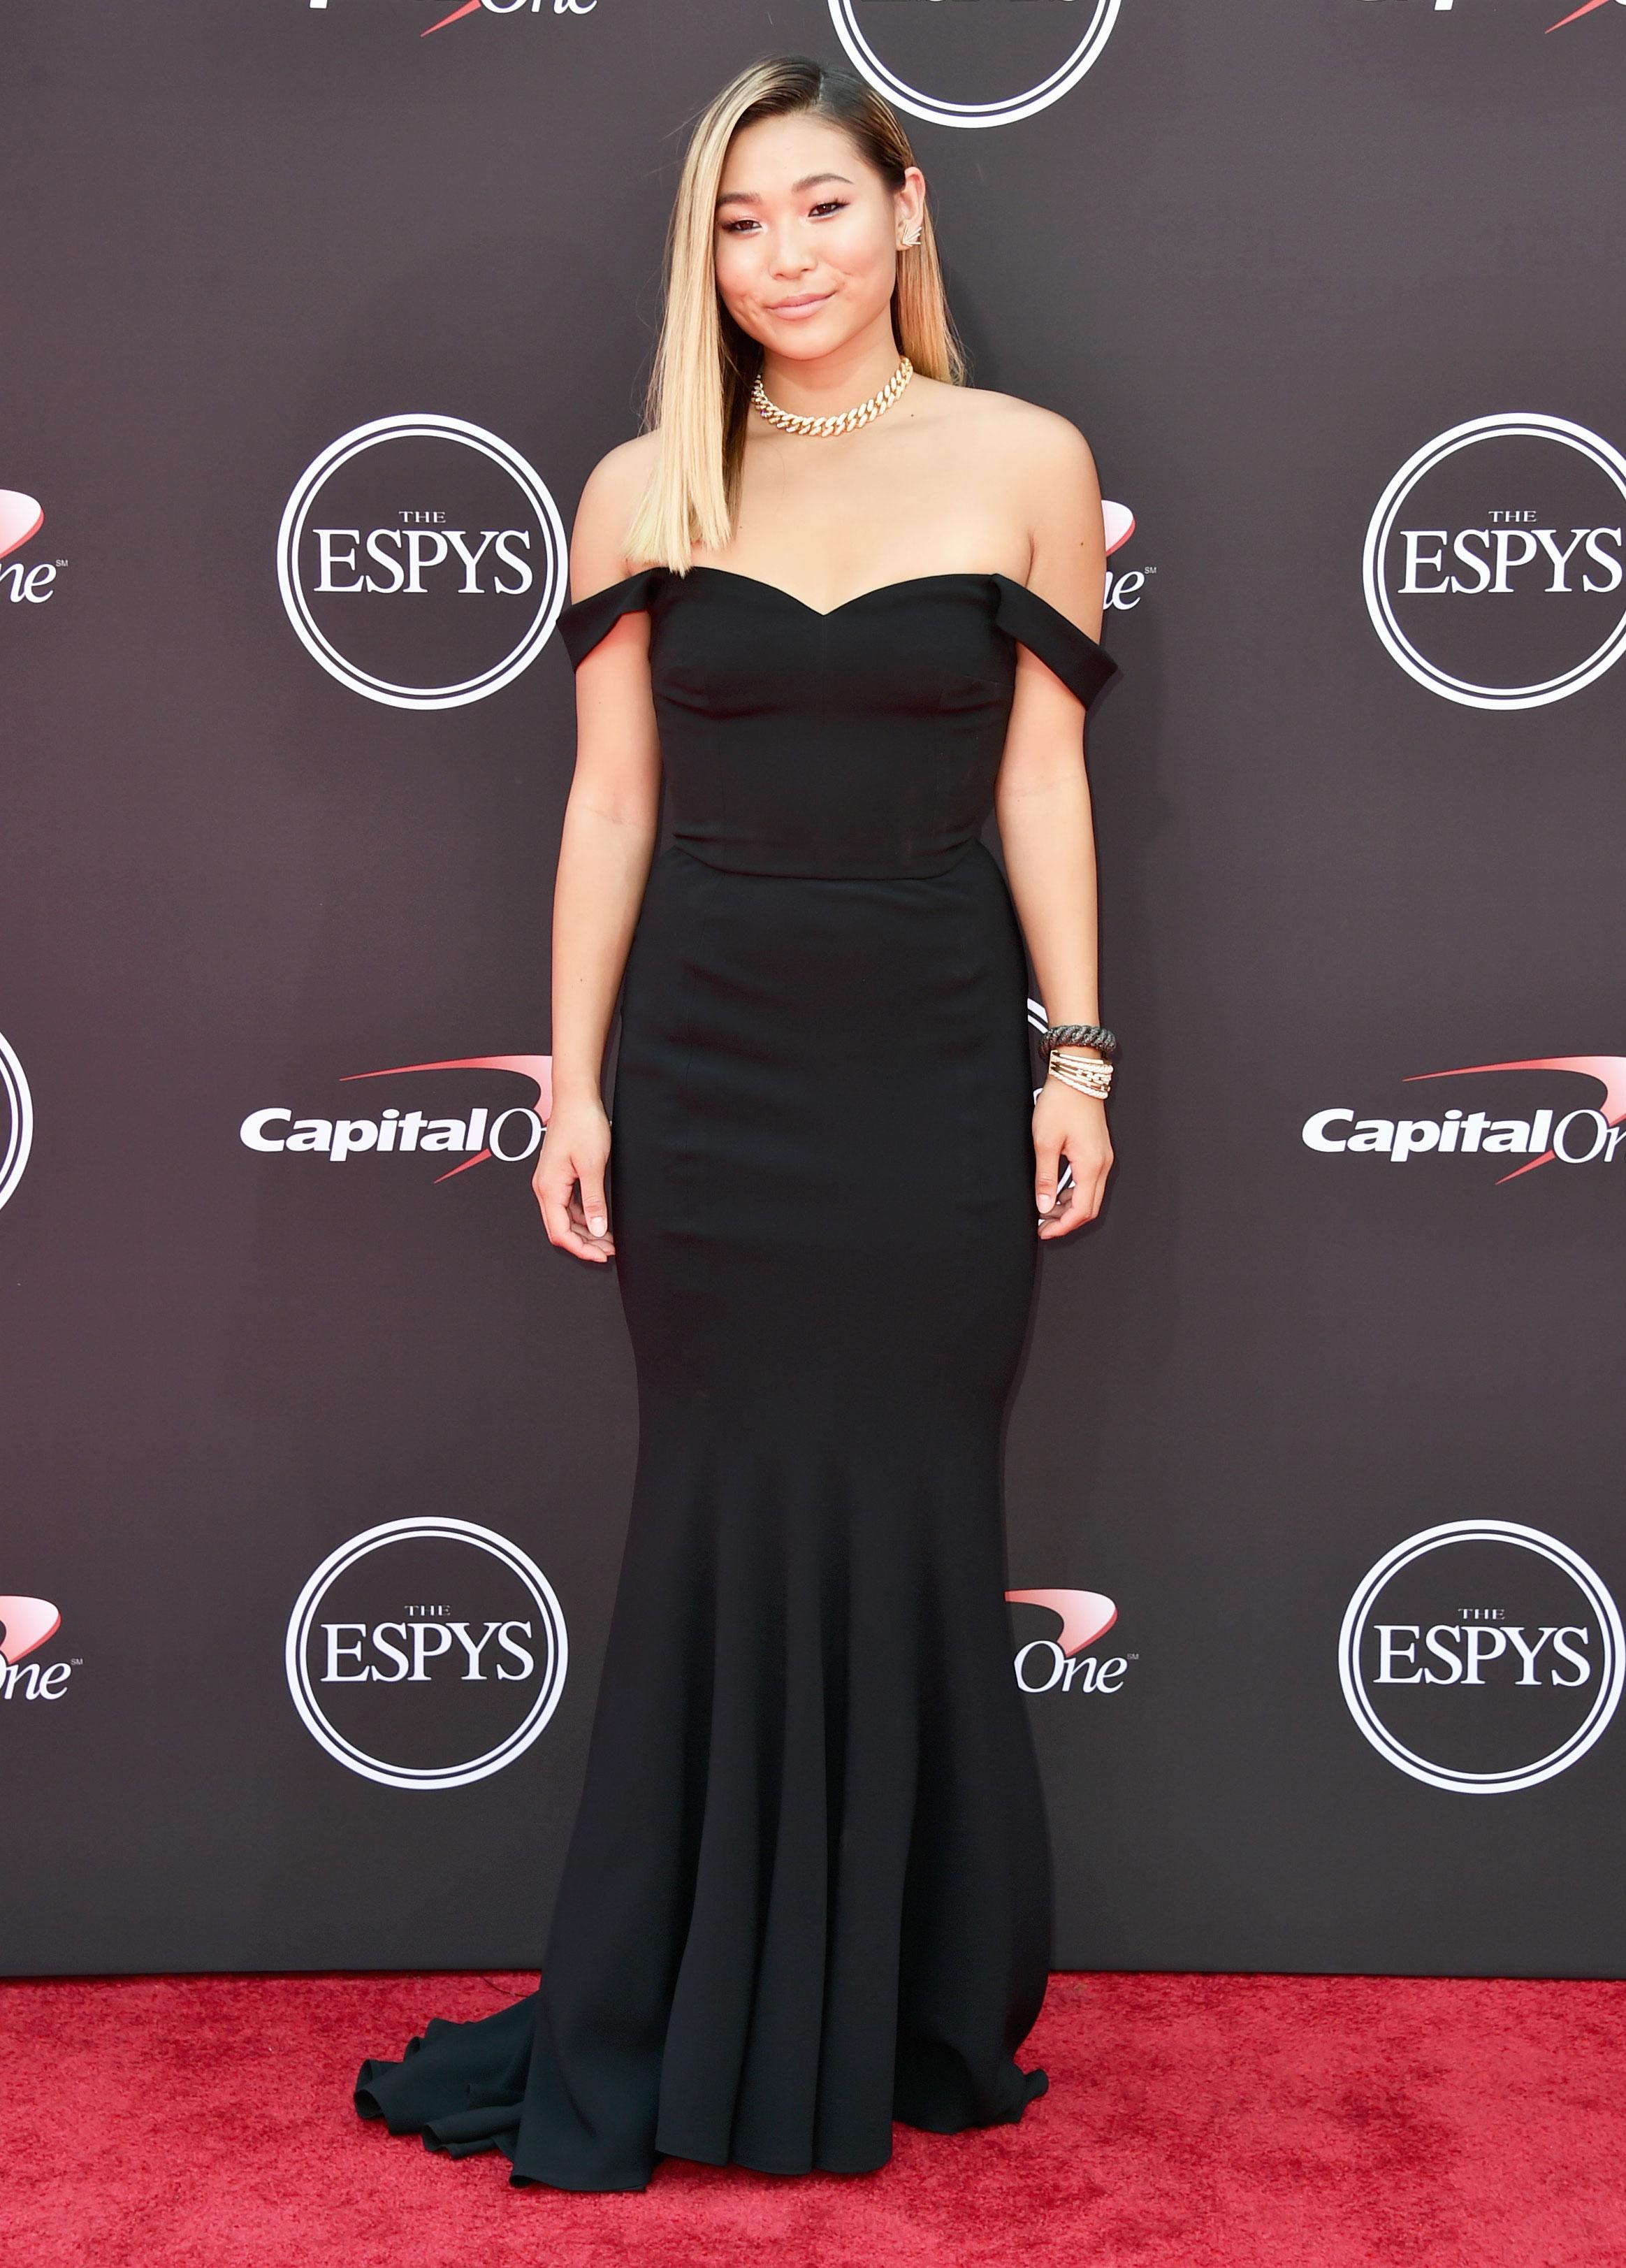 Chloe-Kim-espys - Wearing a black off-the-shoulder Dolce & Gabbana gown.